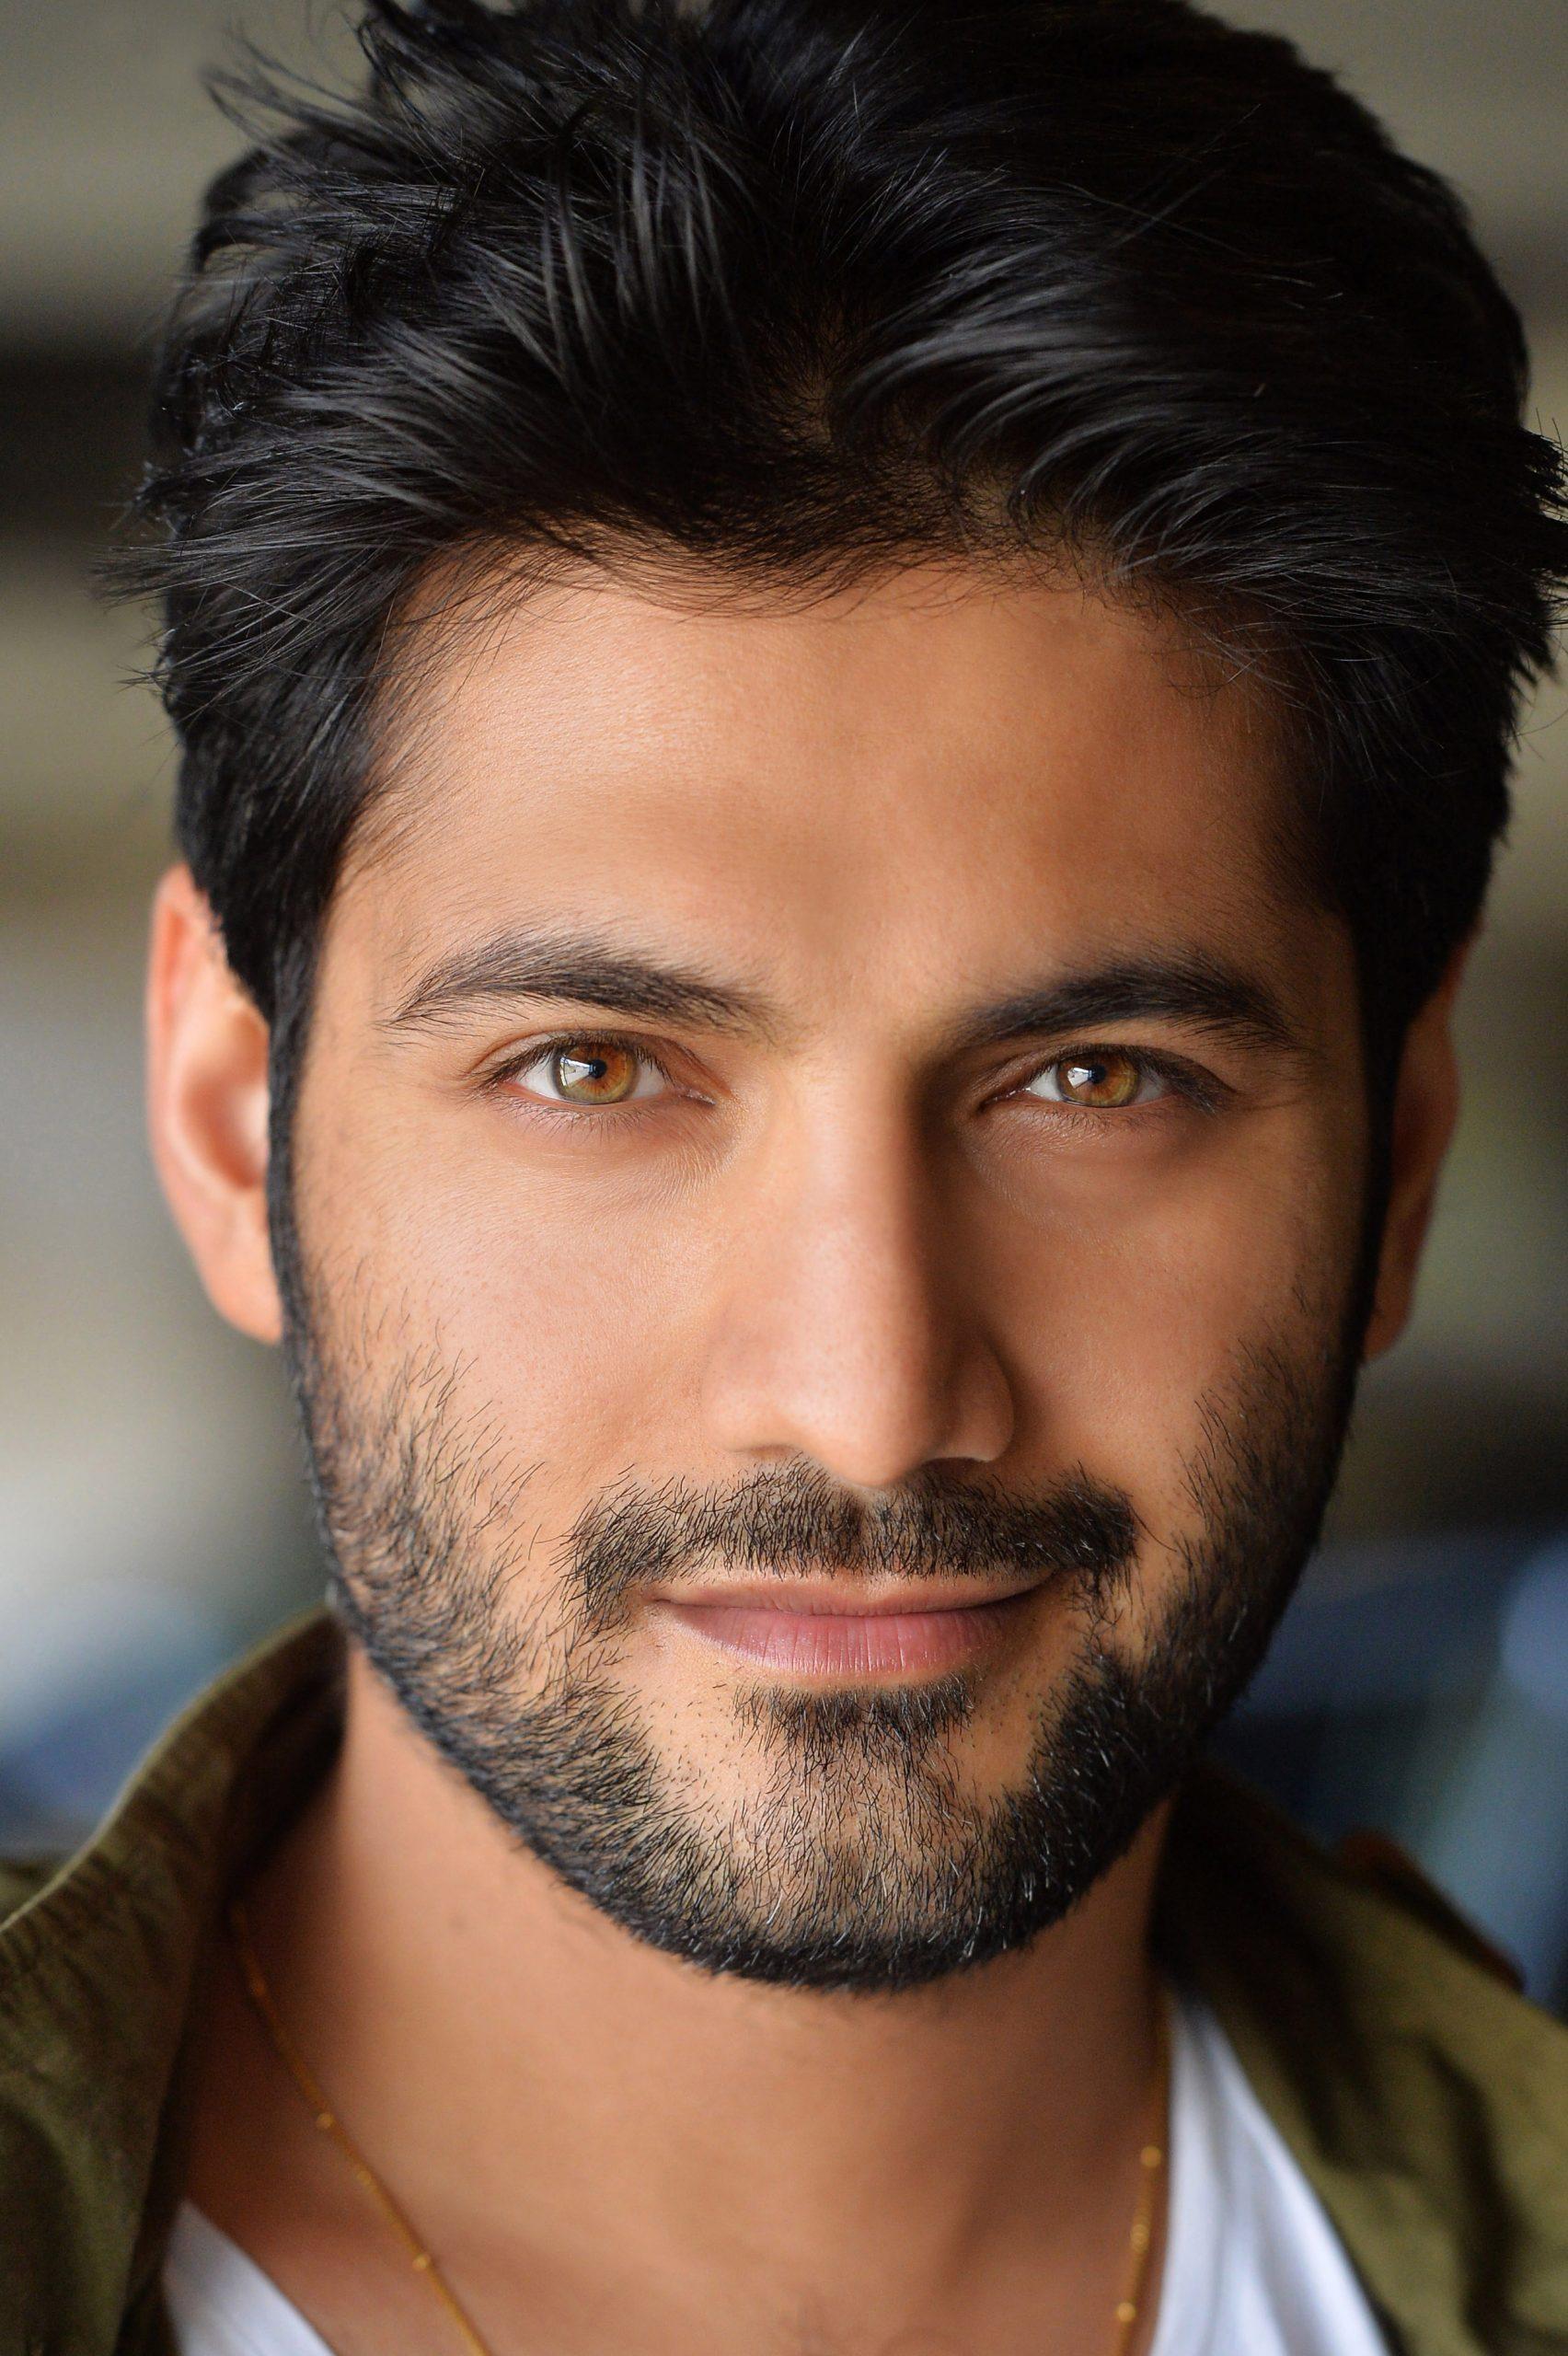 Raaghavv Chanana Indian Actor